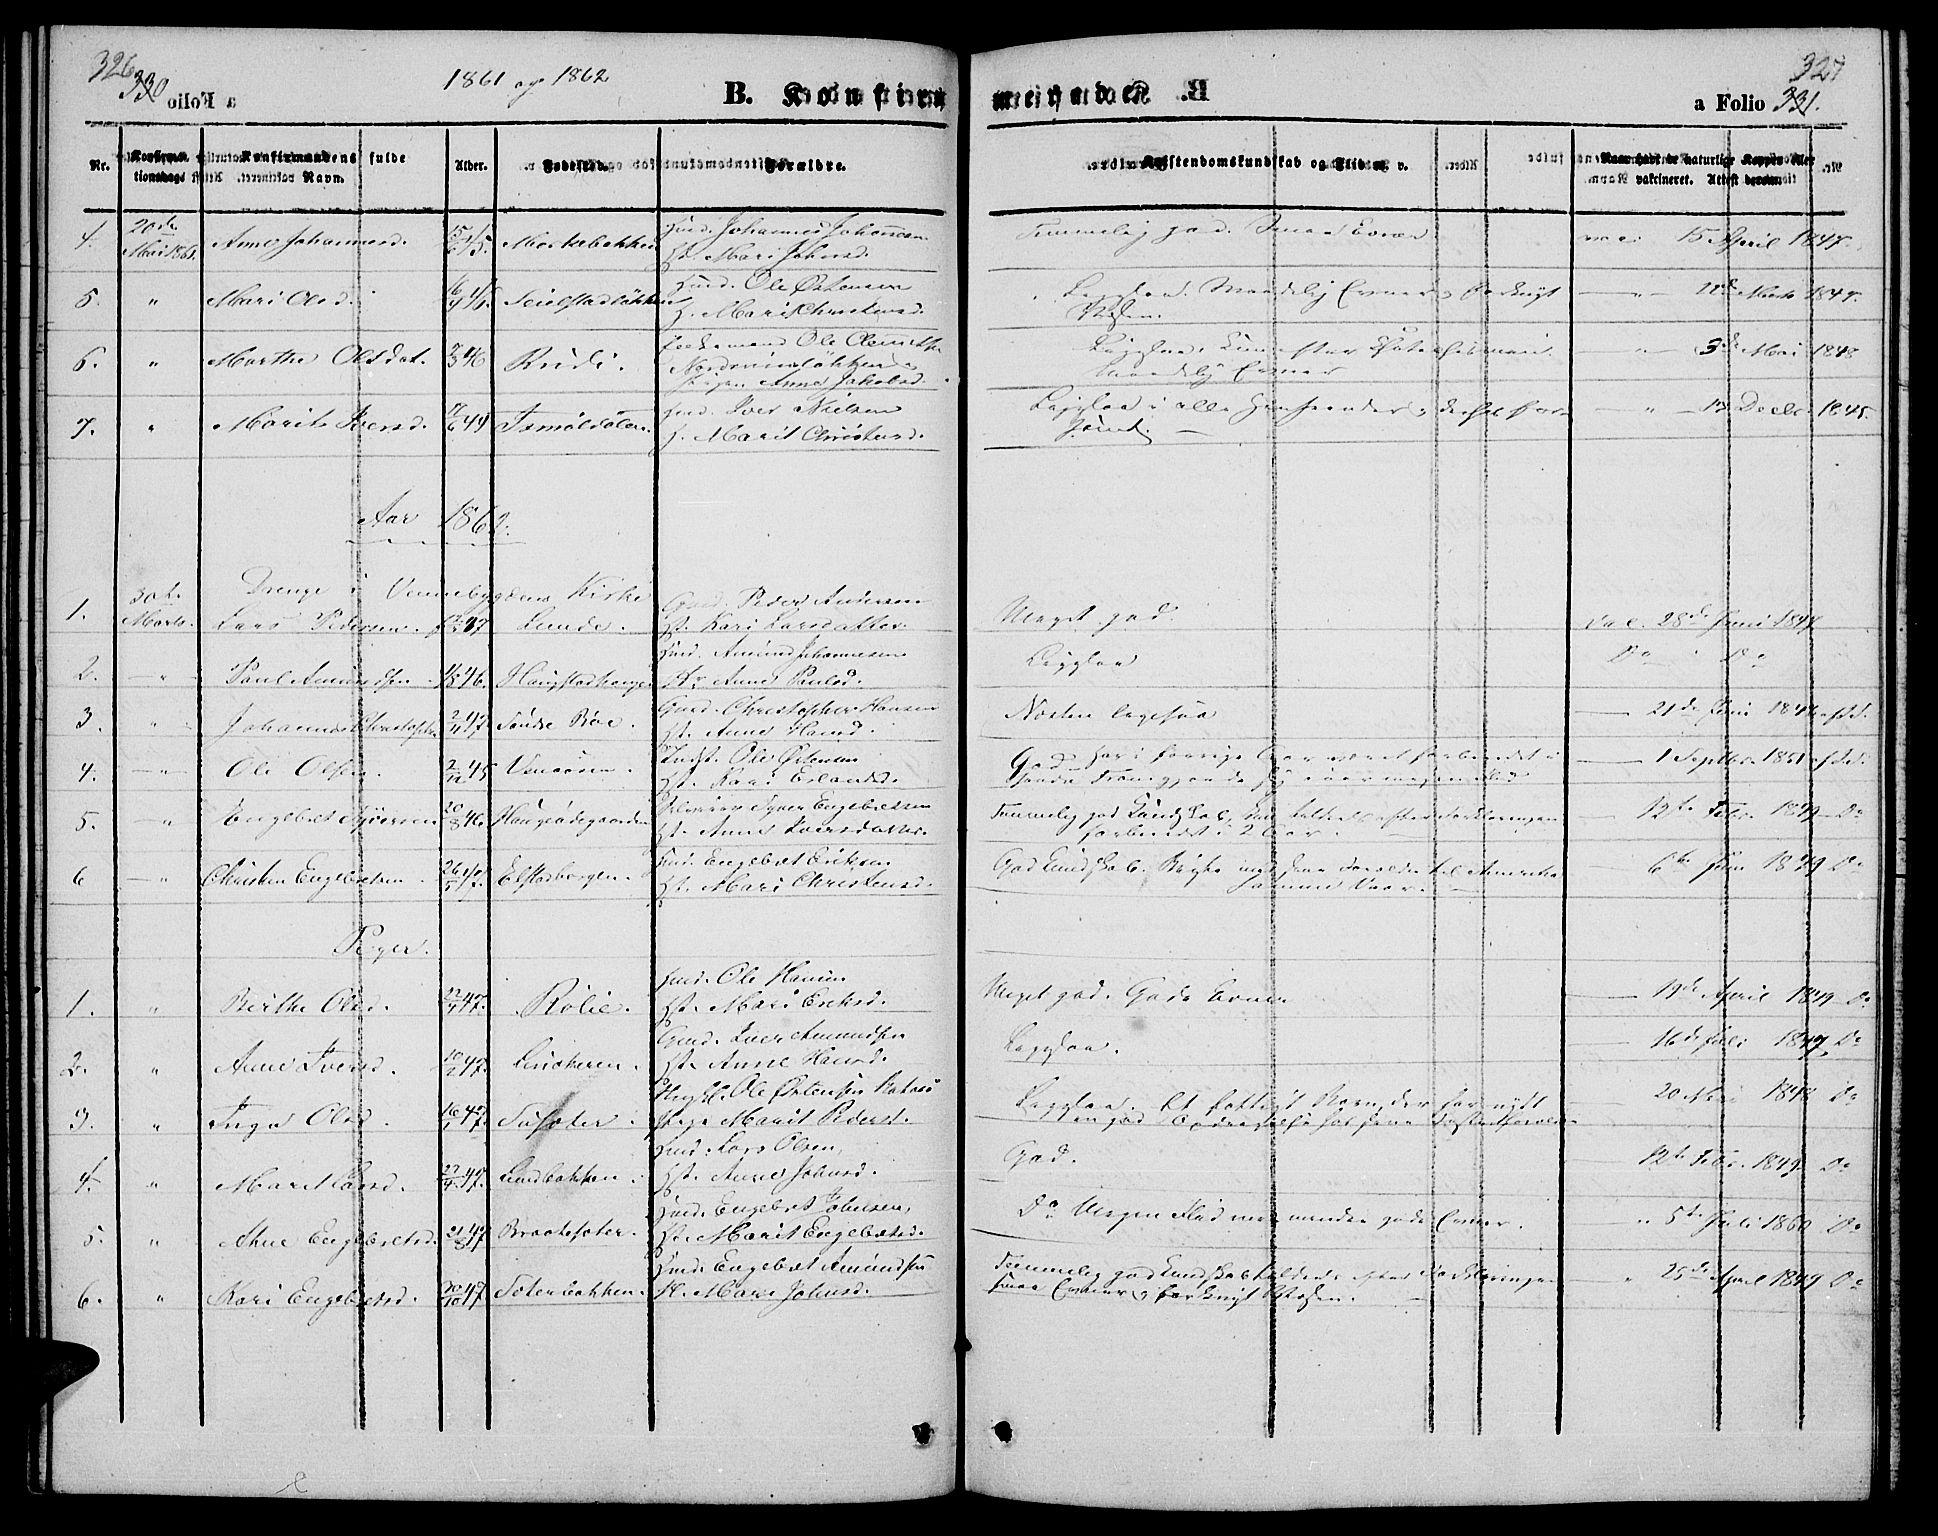 SAH, Ringebu prestekontor, Klokkerbok nr. 3, 1854-1866, s. 326-327